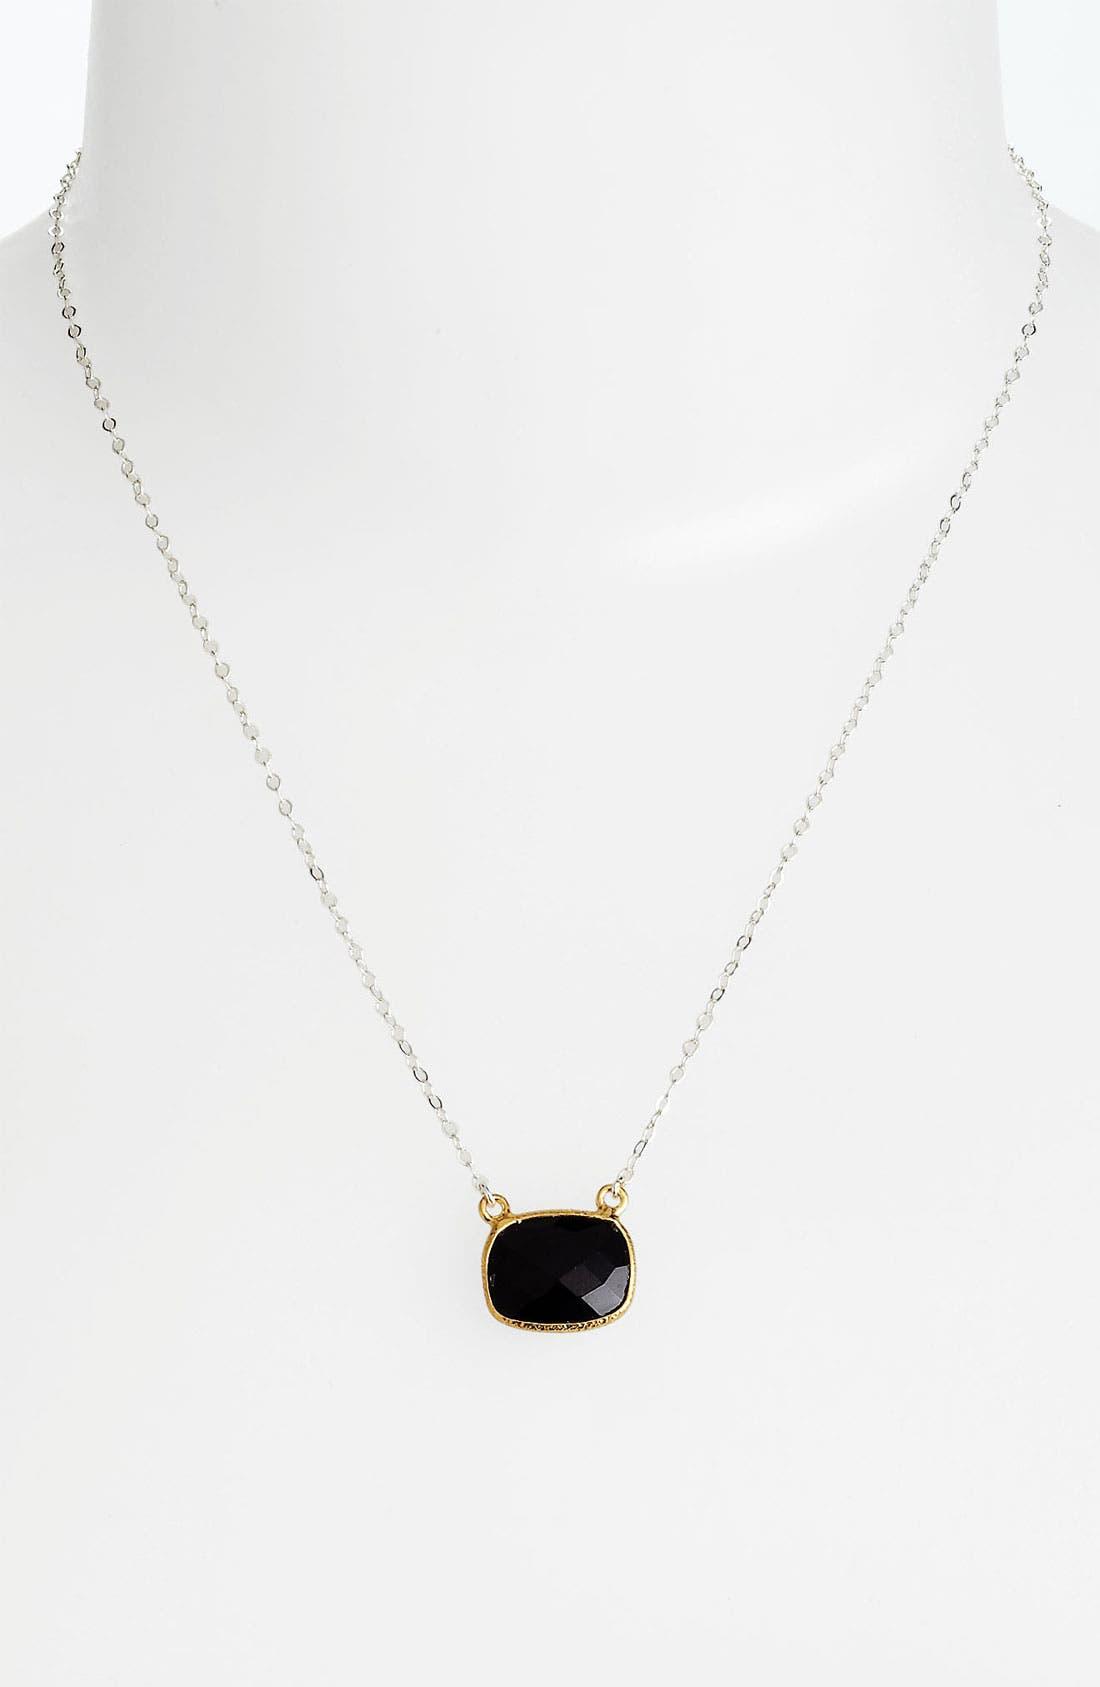 Alternate Image 1 Selected - Argento Vivo 'Bauble Bar' Pendant Necklace (Nordstrom Exclusive)